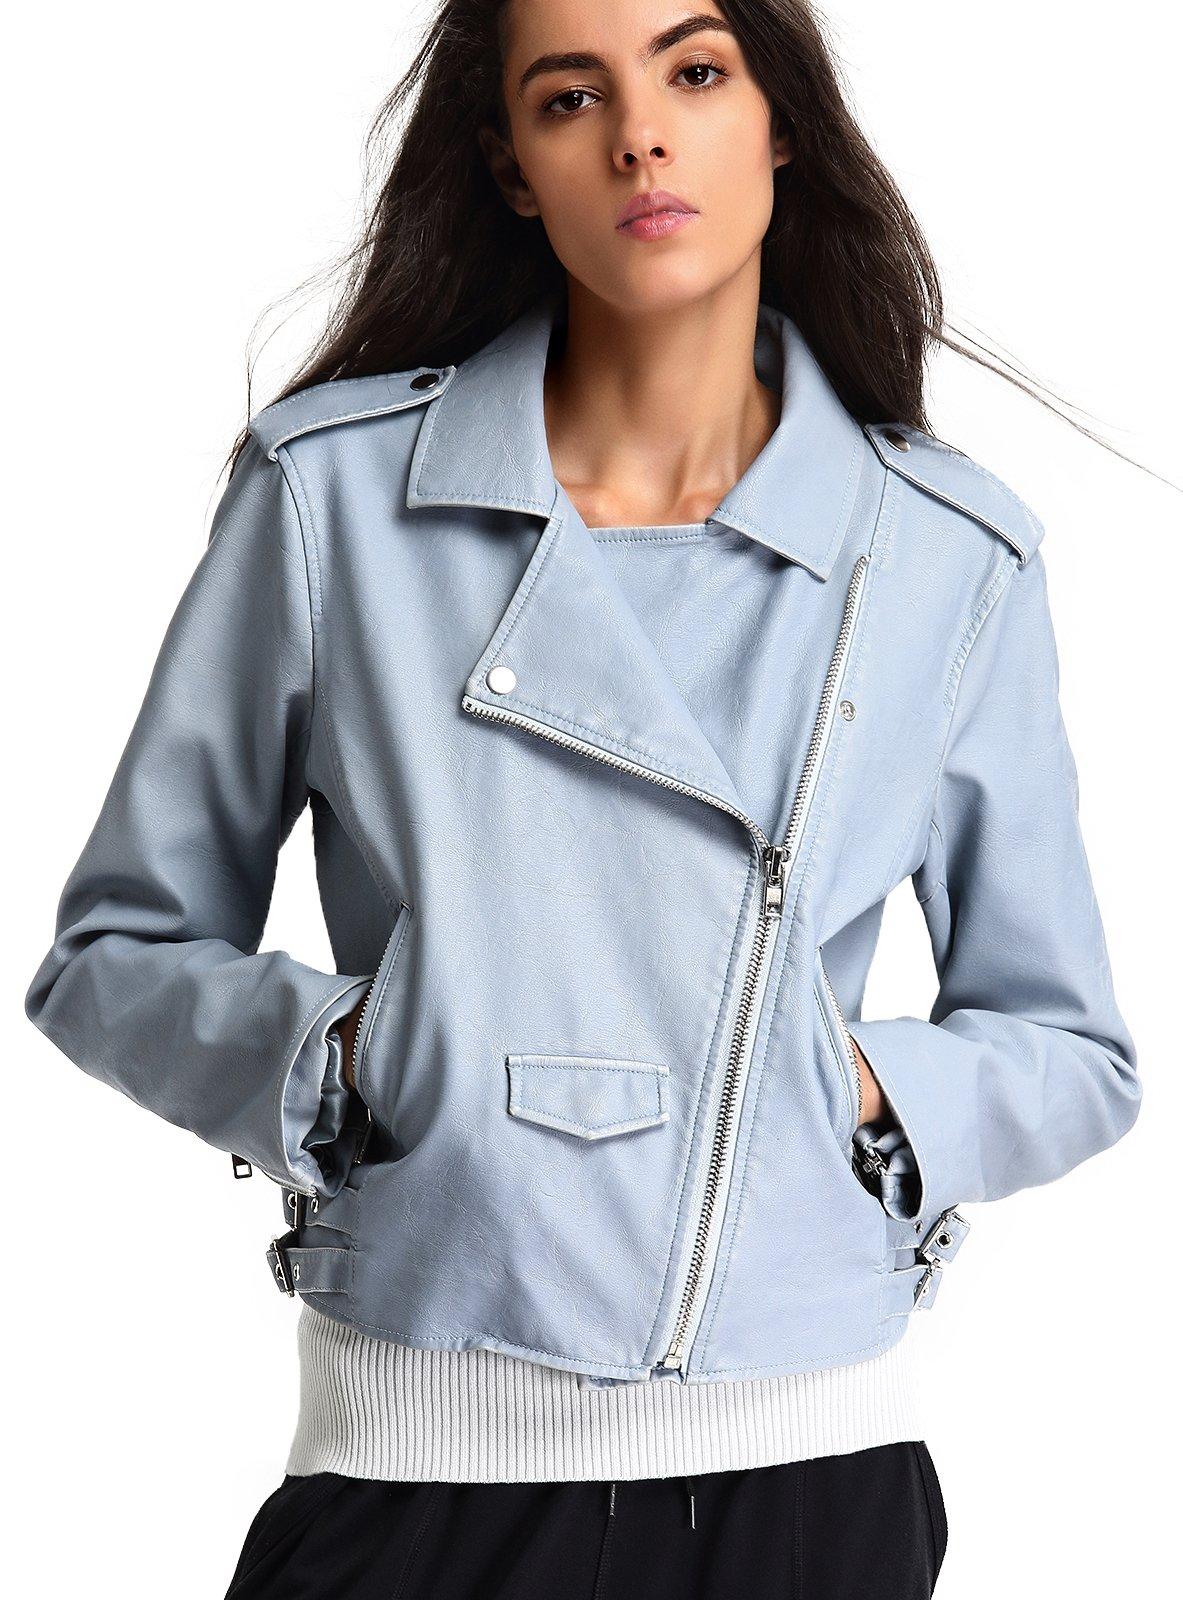 Escalier Women's Faux Leather Jacket Vintage Moto Biker Short Coat,Light Blue,Small